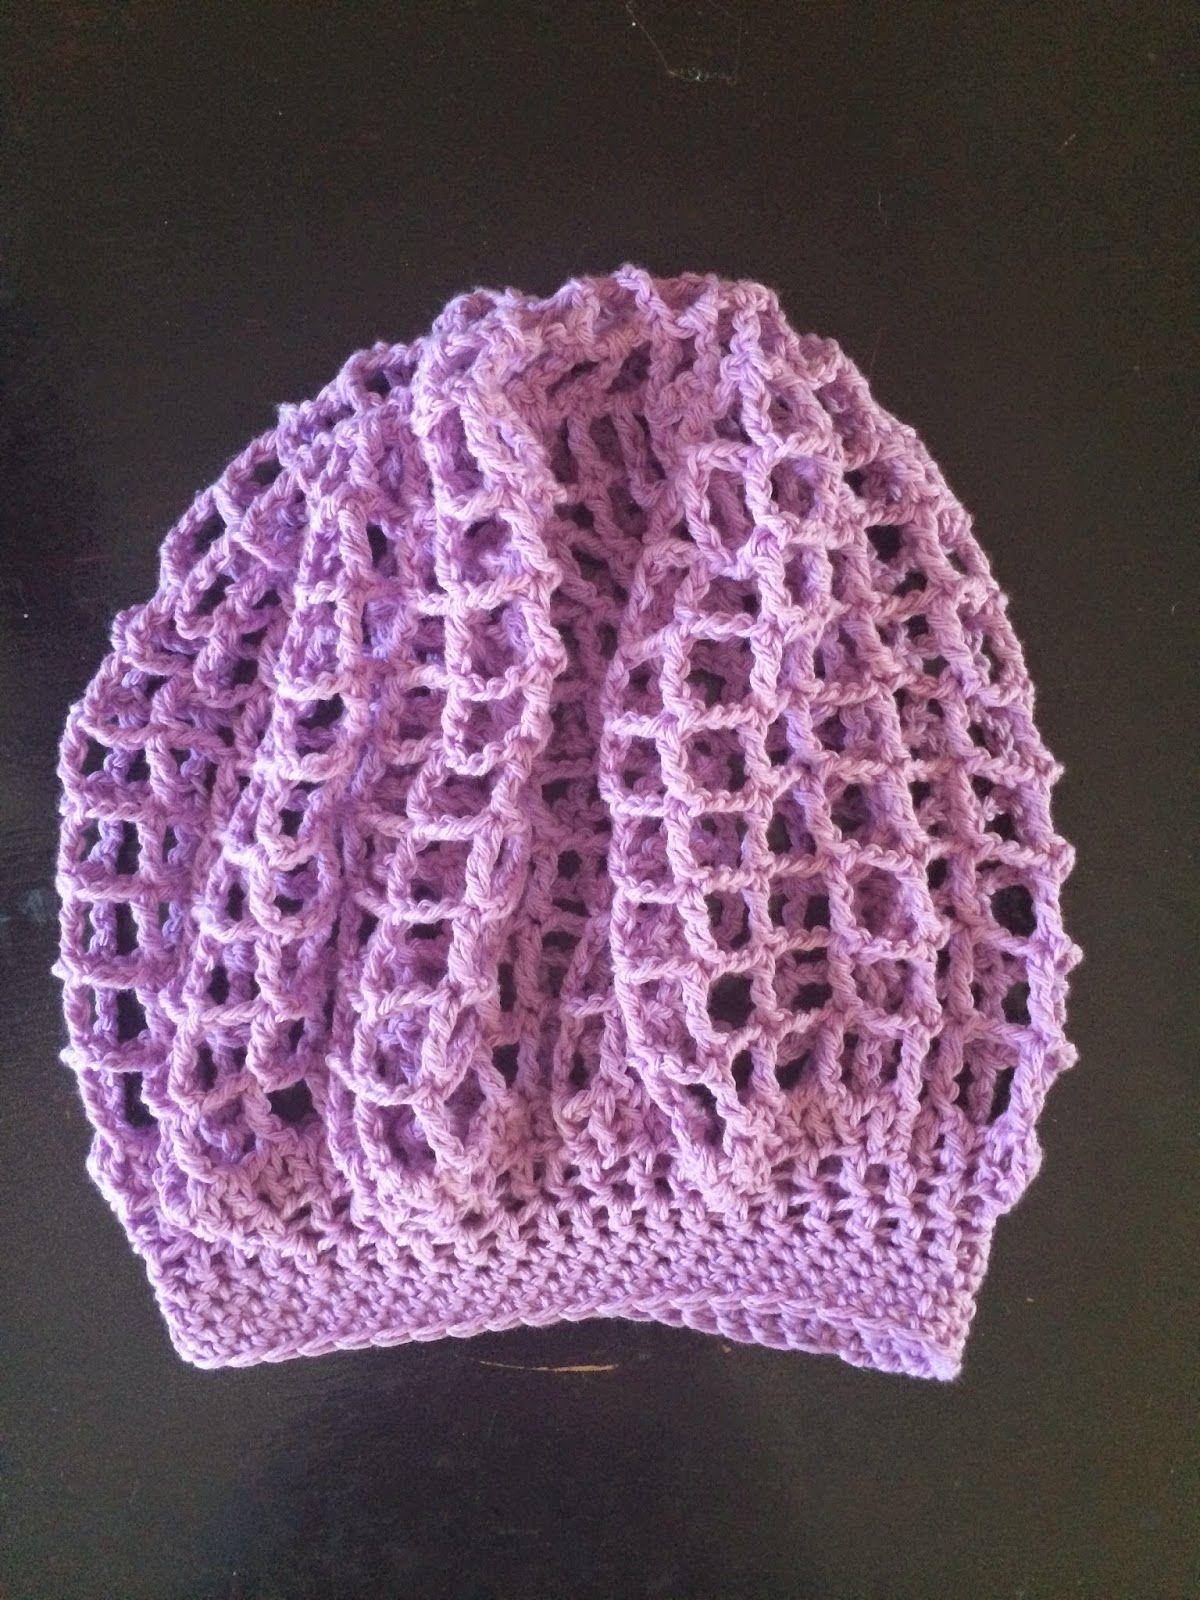 http://bebrightblog.blogspot.com/2014/08/crochet-lacy-hair-net ...